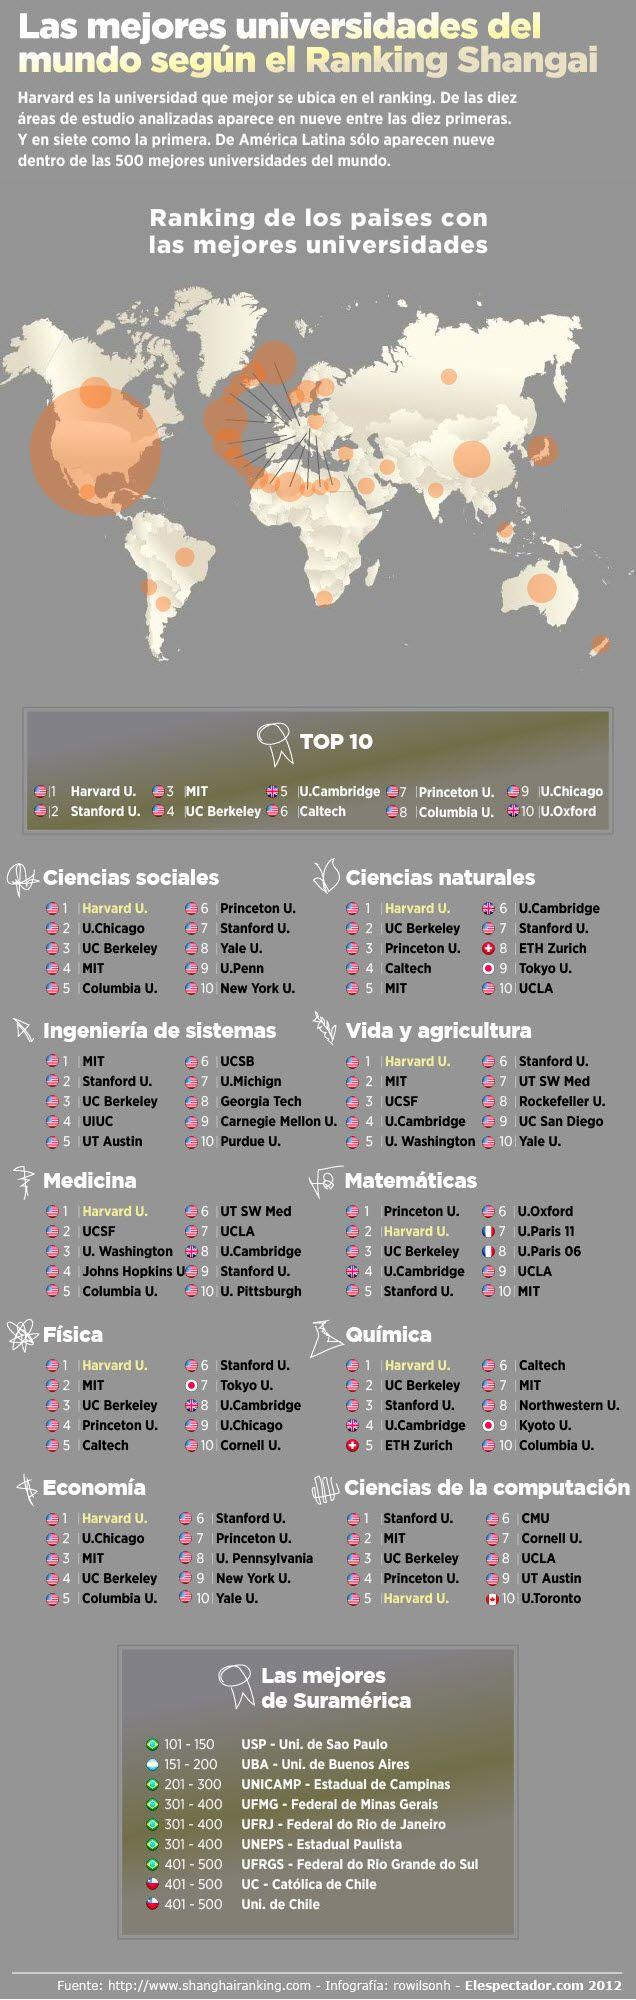 Ranking 2012 mejores universidades del Mundo #infografia #infographic #education